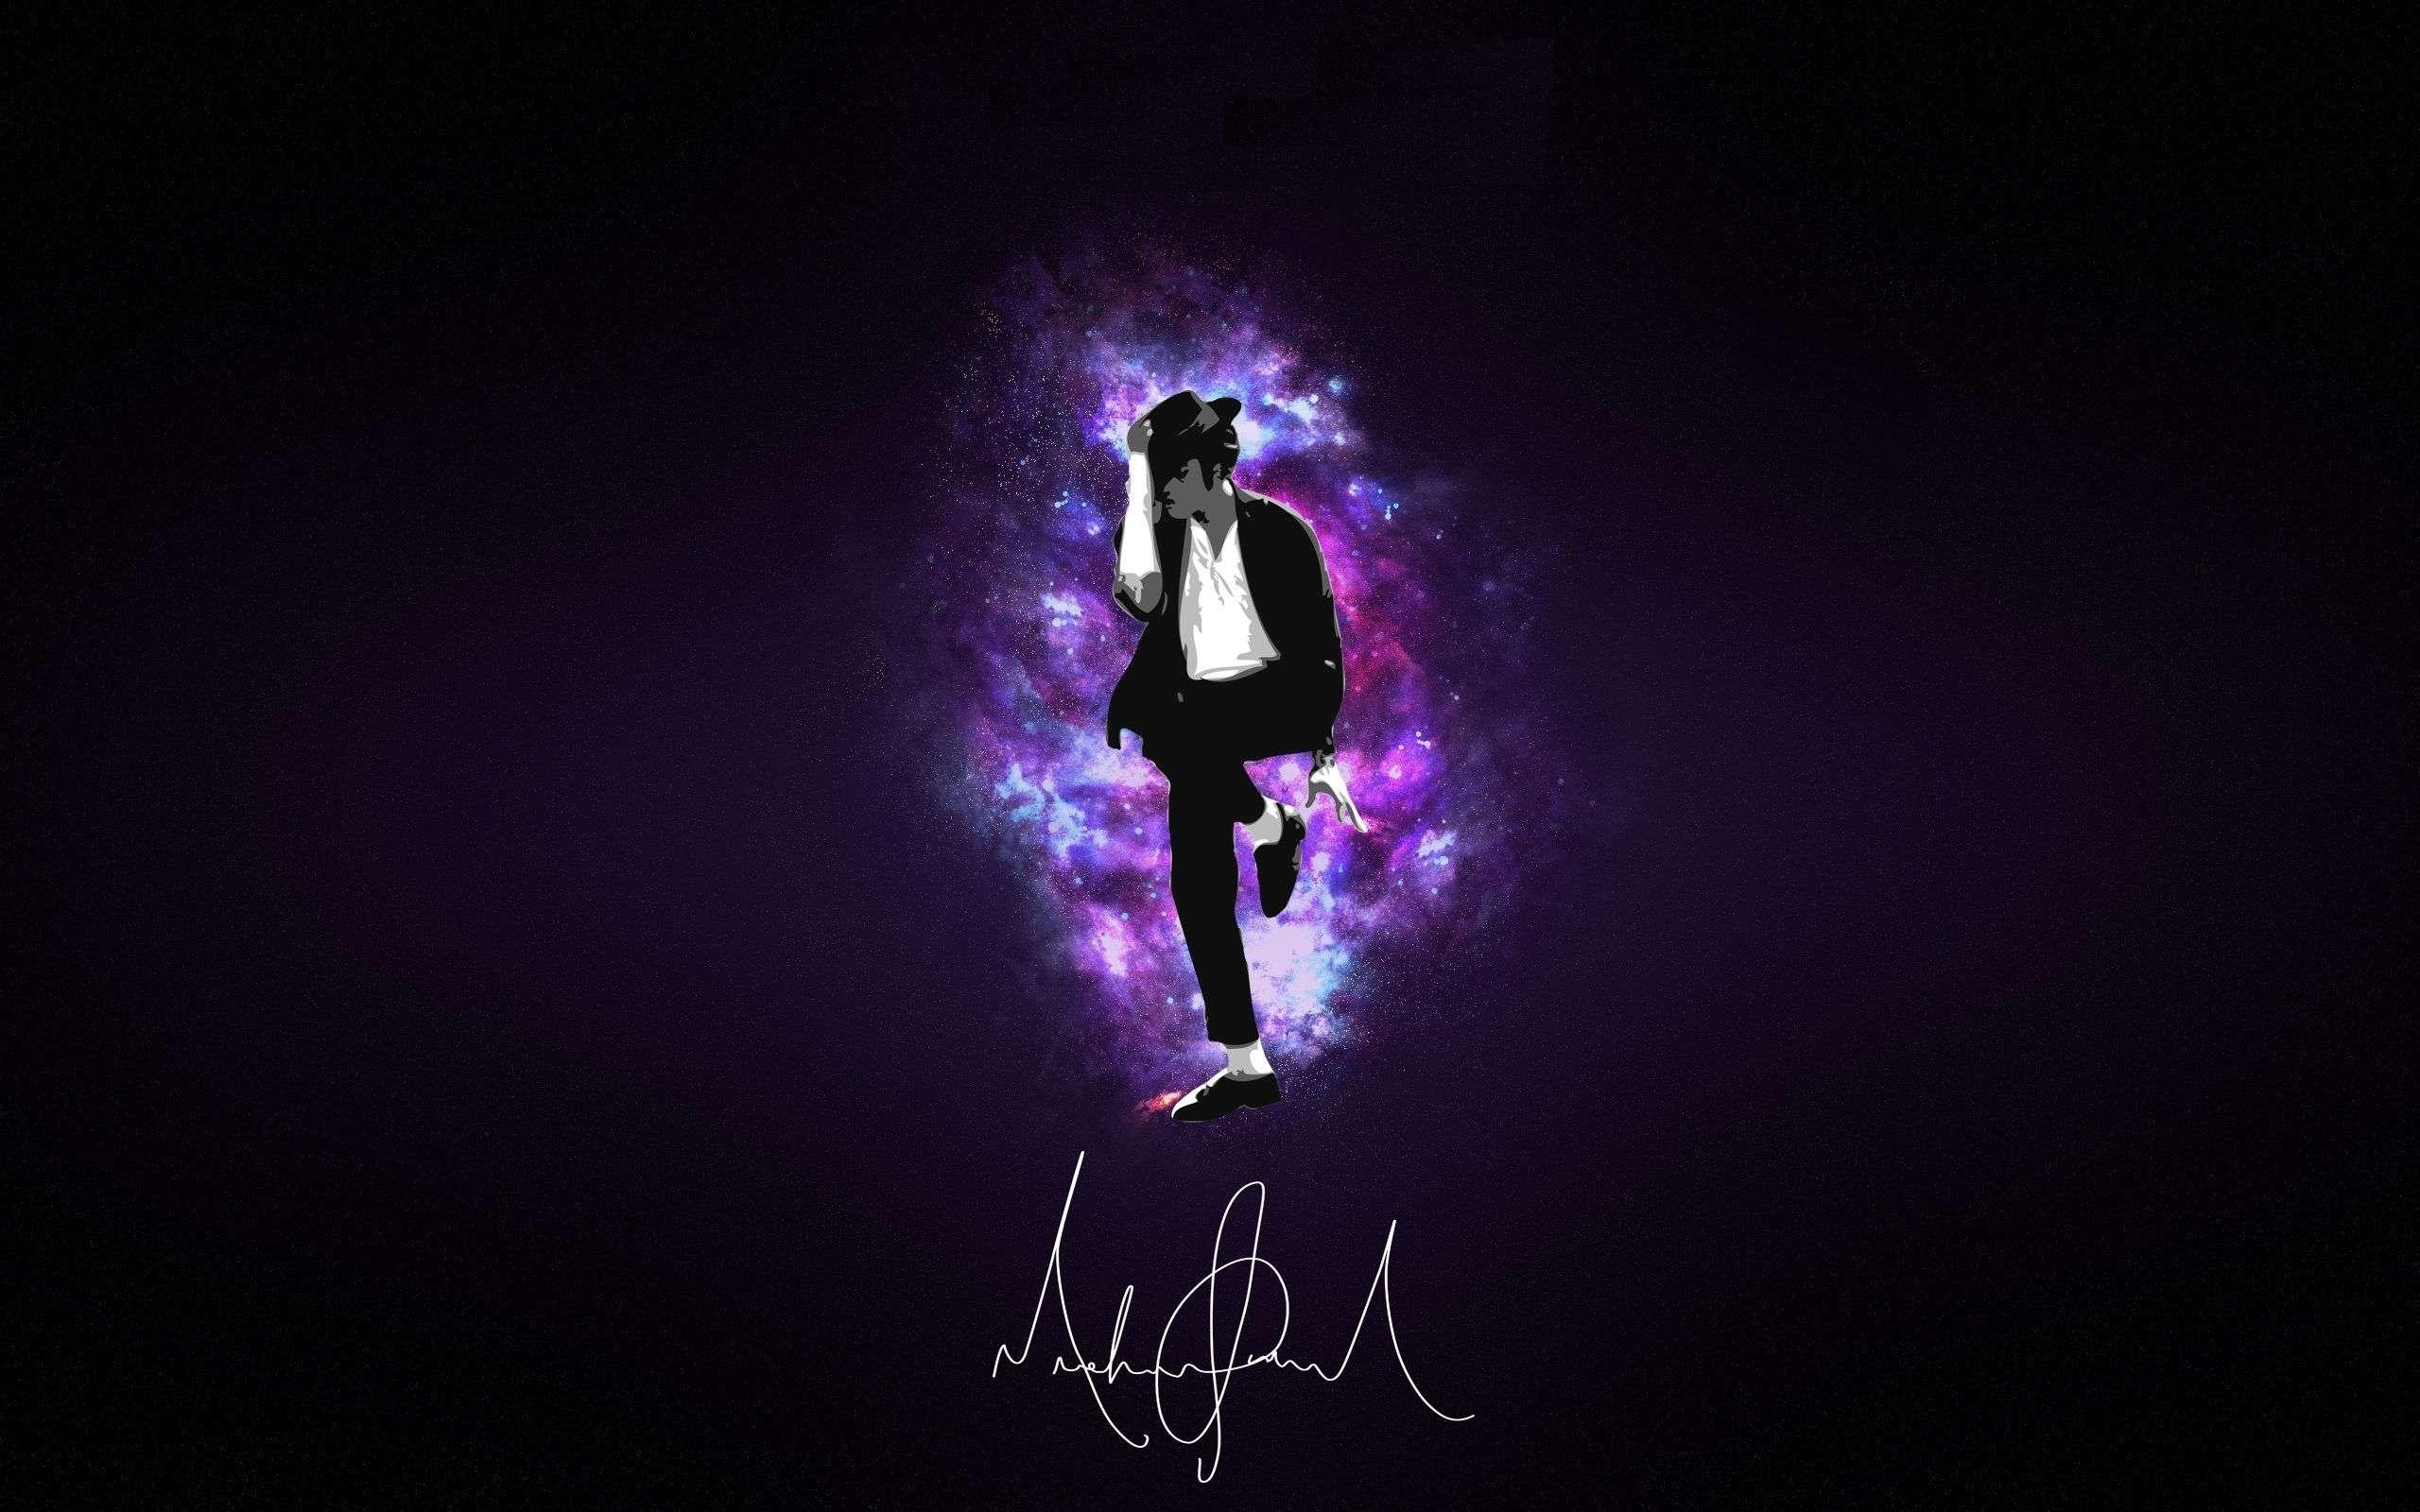 Michael Jackson Wallpaper 017